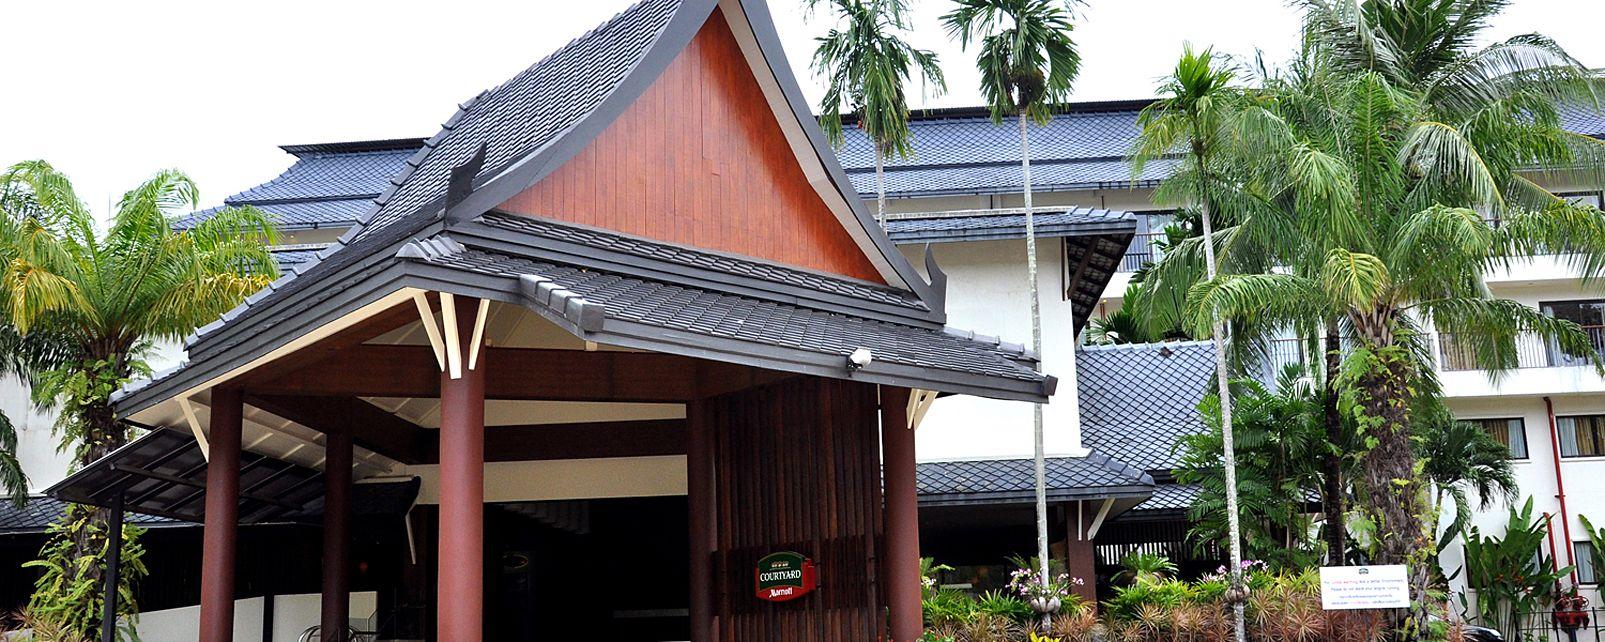 Hotel Courtyard Phuket at Kamala Beach